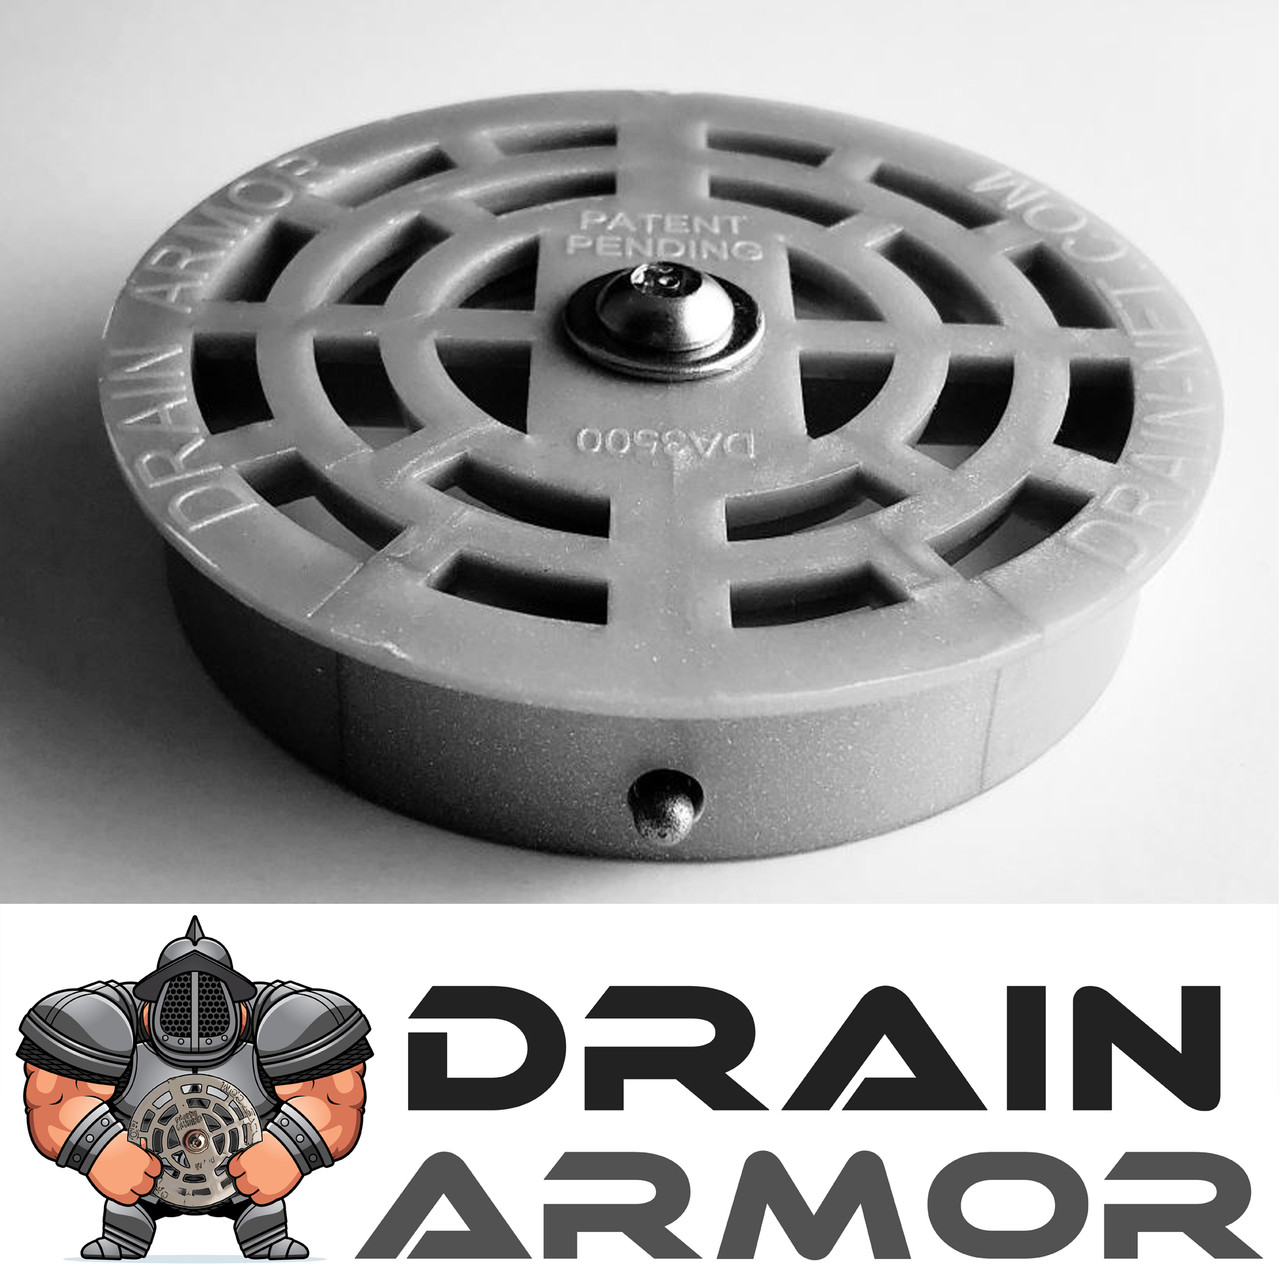 Drain Armor - Compartment Sink Drain Lock